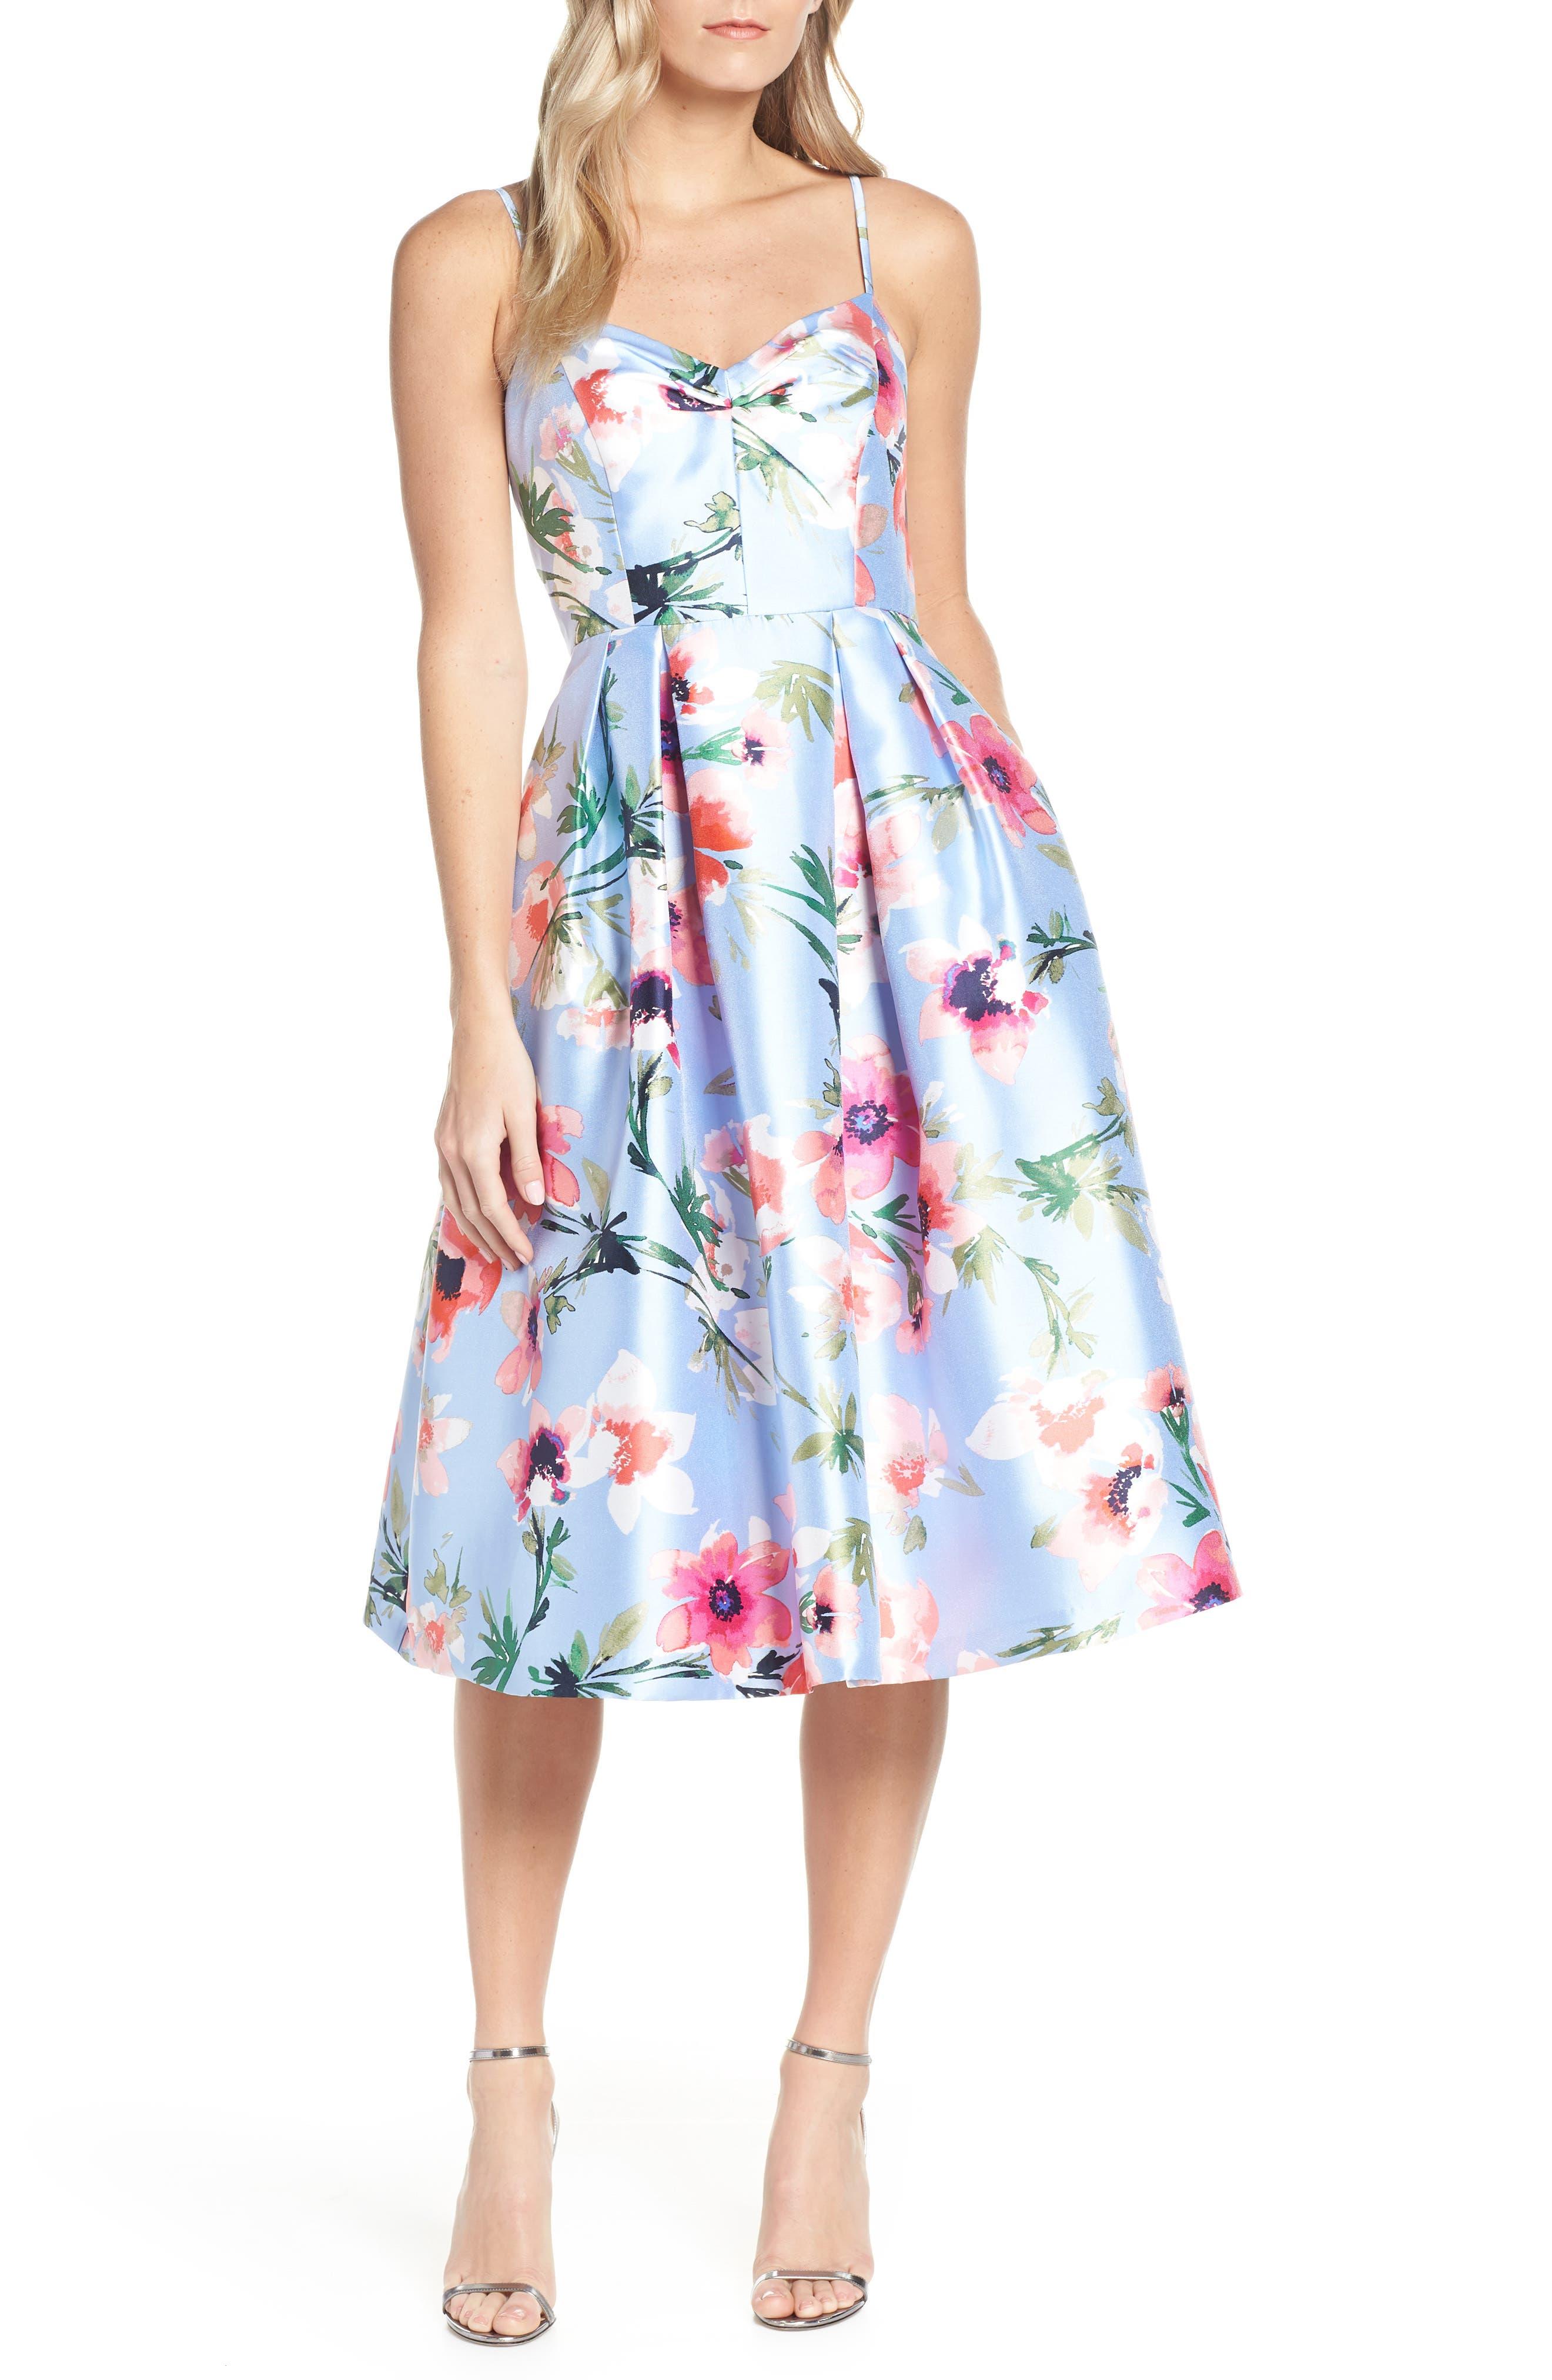 ELIZA J Floral Print Satin Cocktail Dress, Main, color, BLUE